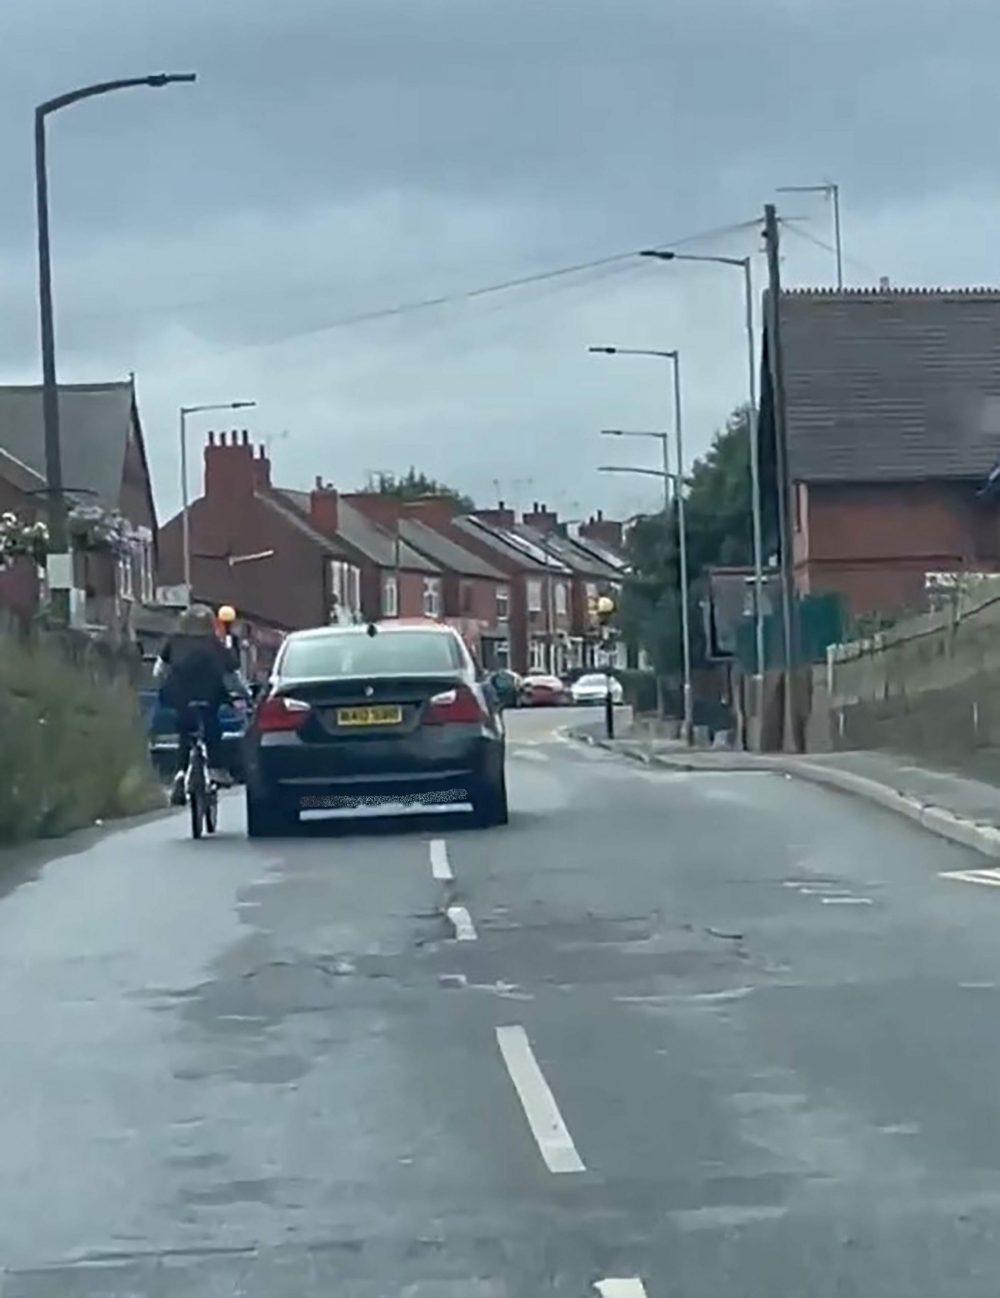 The cyclist hitching a lift - Traffic News UK